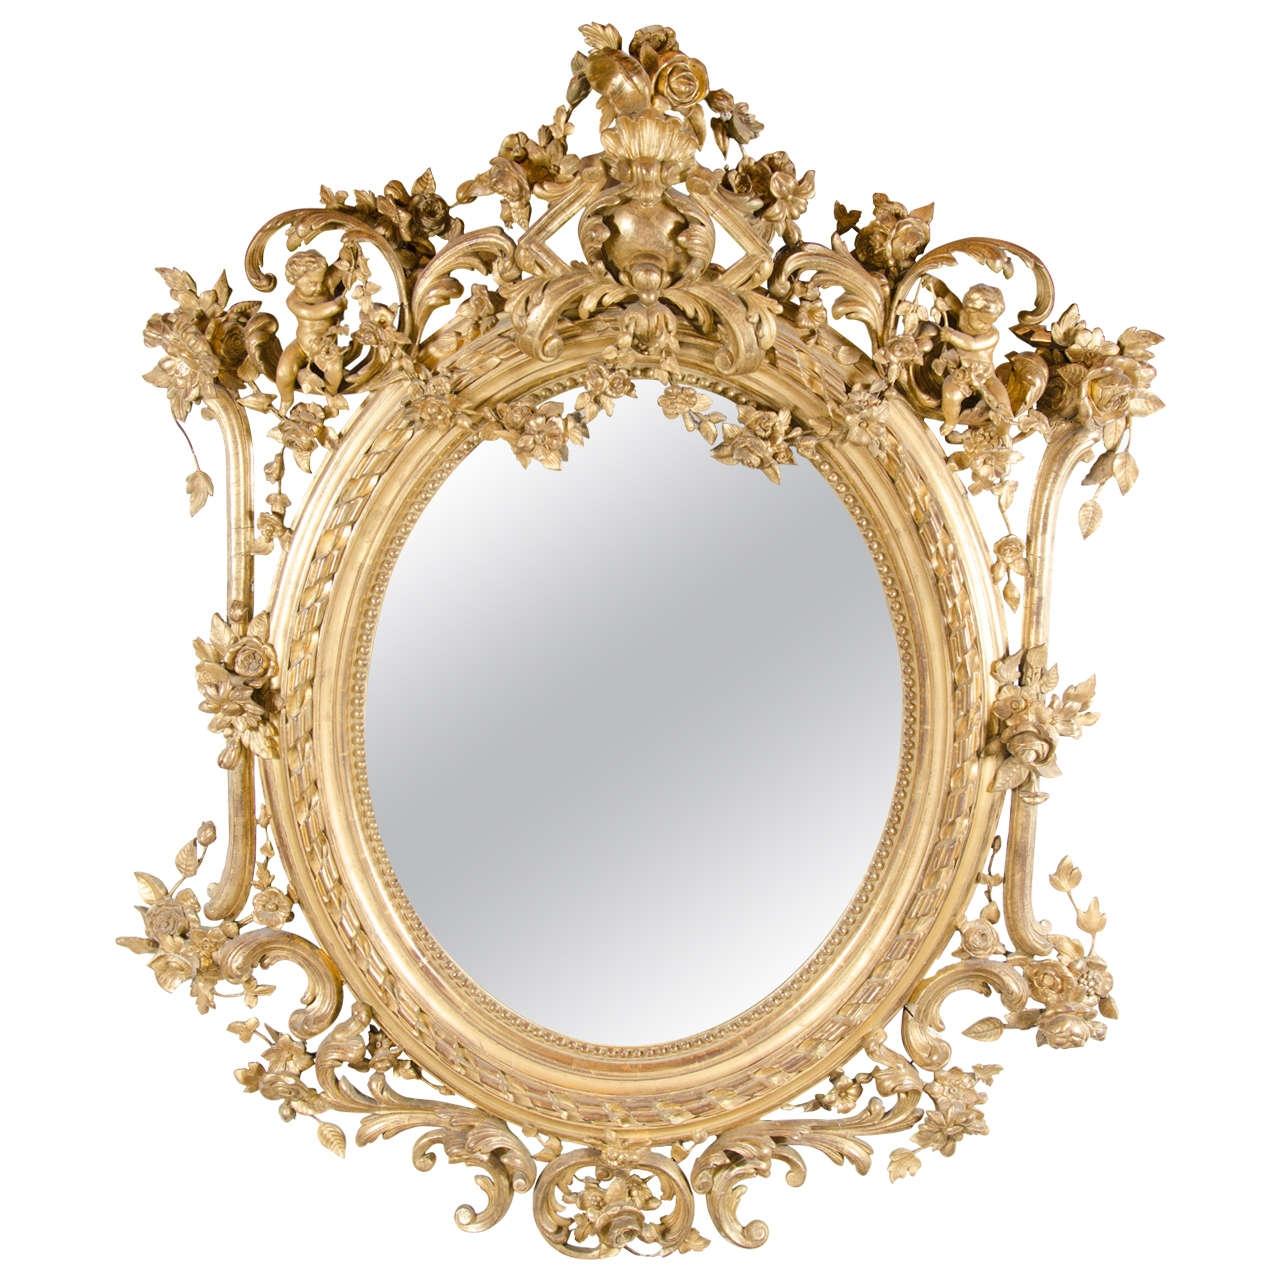 Extraordinary 19th Century French Carved Gilt Cherub Rococo In Rococo Mirrors (View 6 of 15)